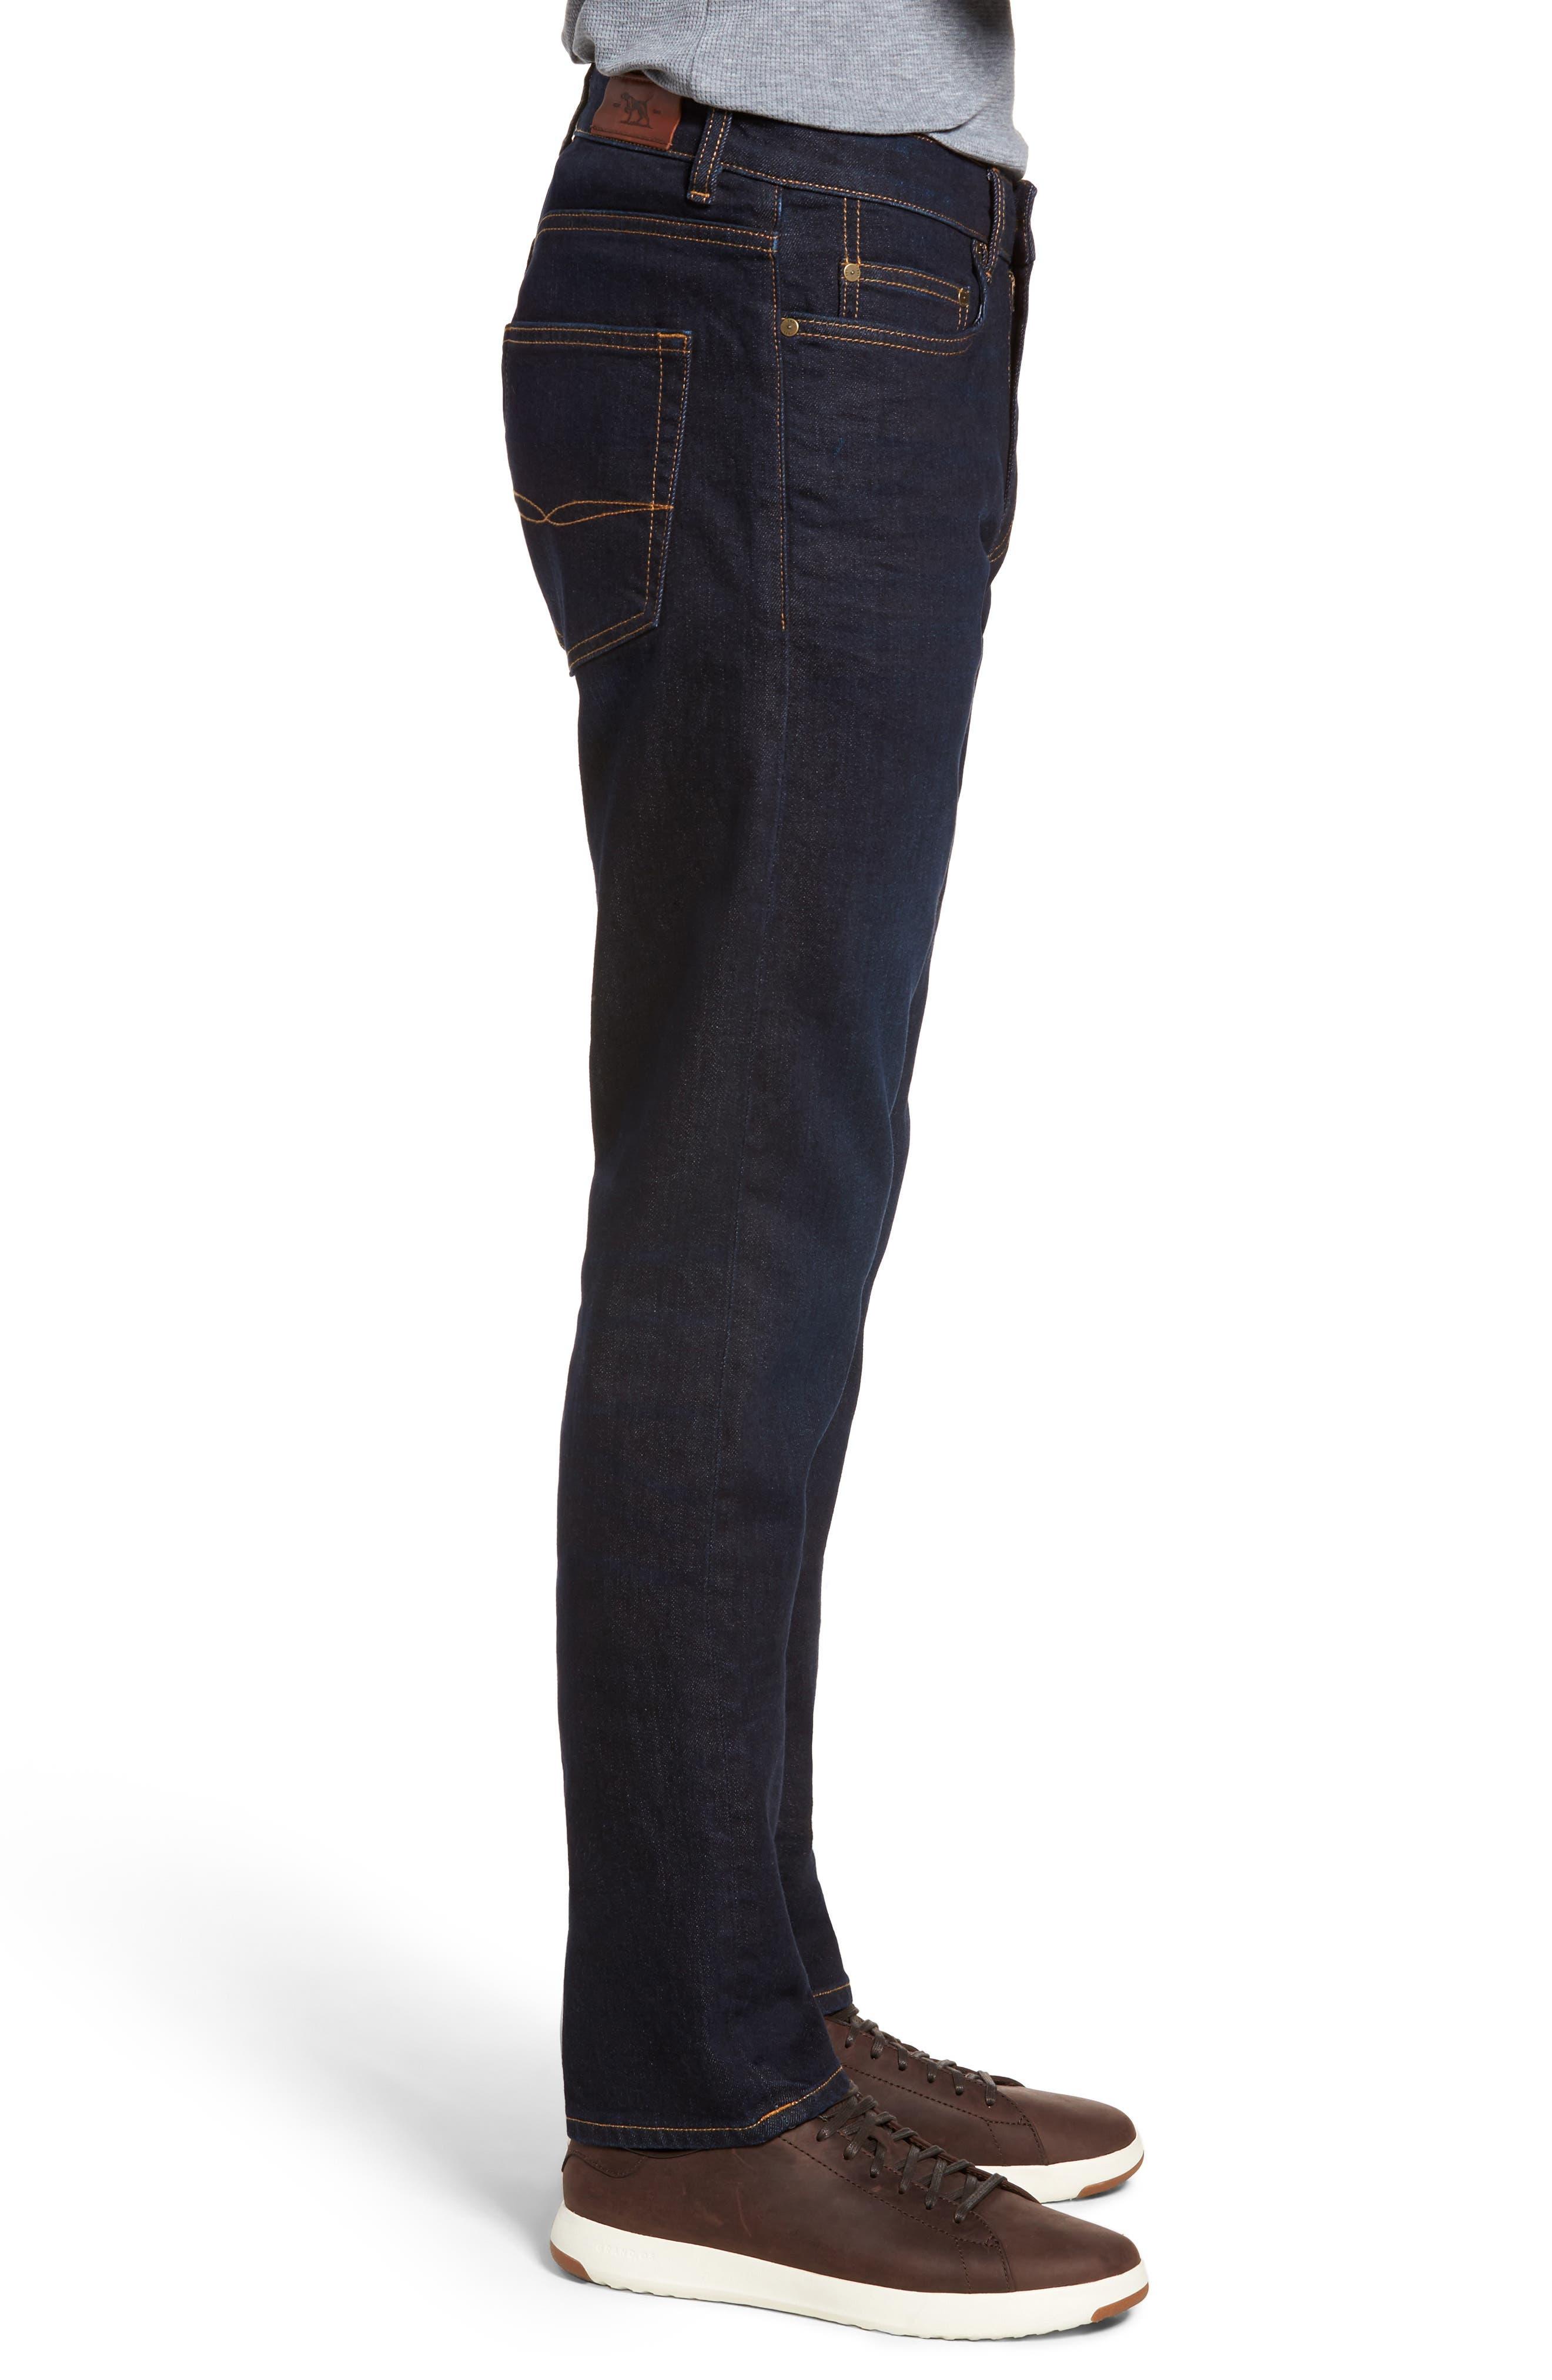 Fanshawe Straight Leg Jeans,                             Alternate thumbnail 3, color,                             Denim